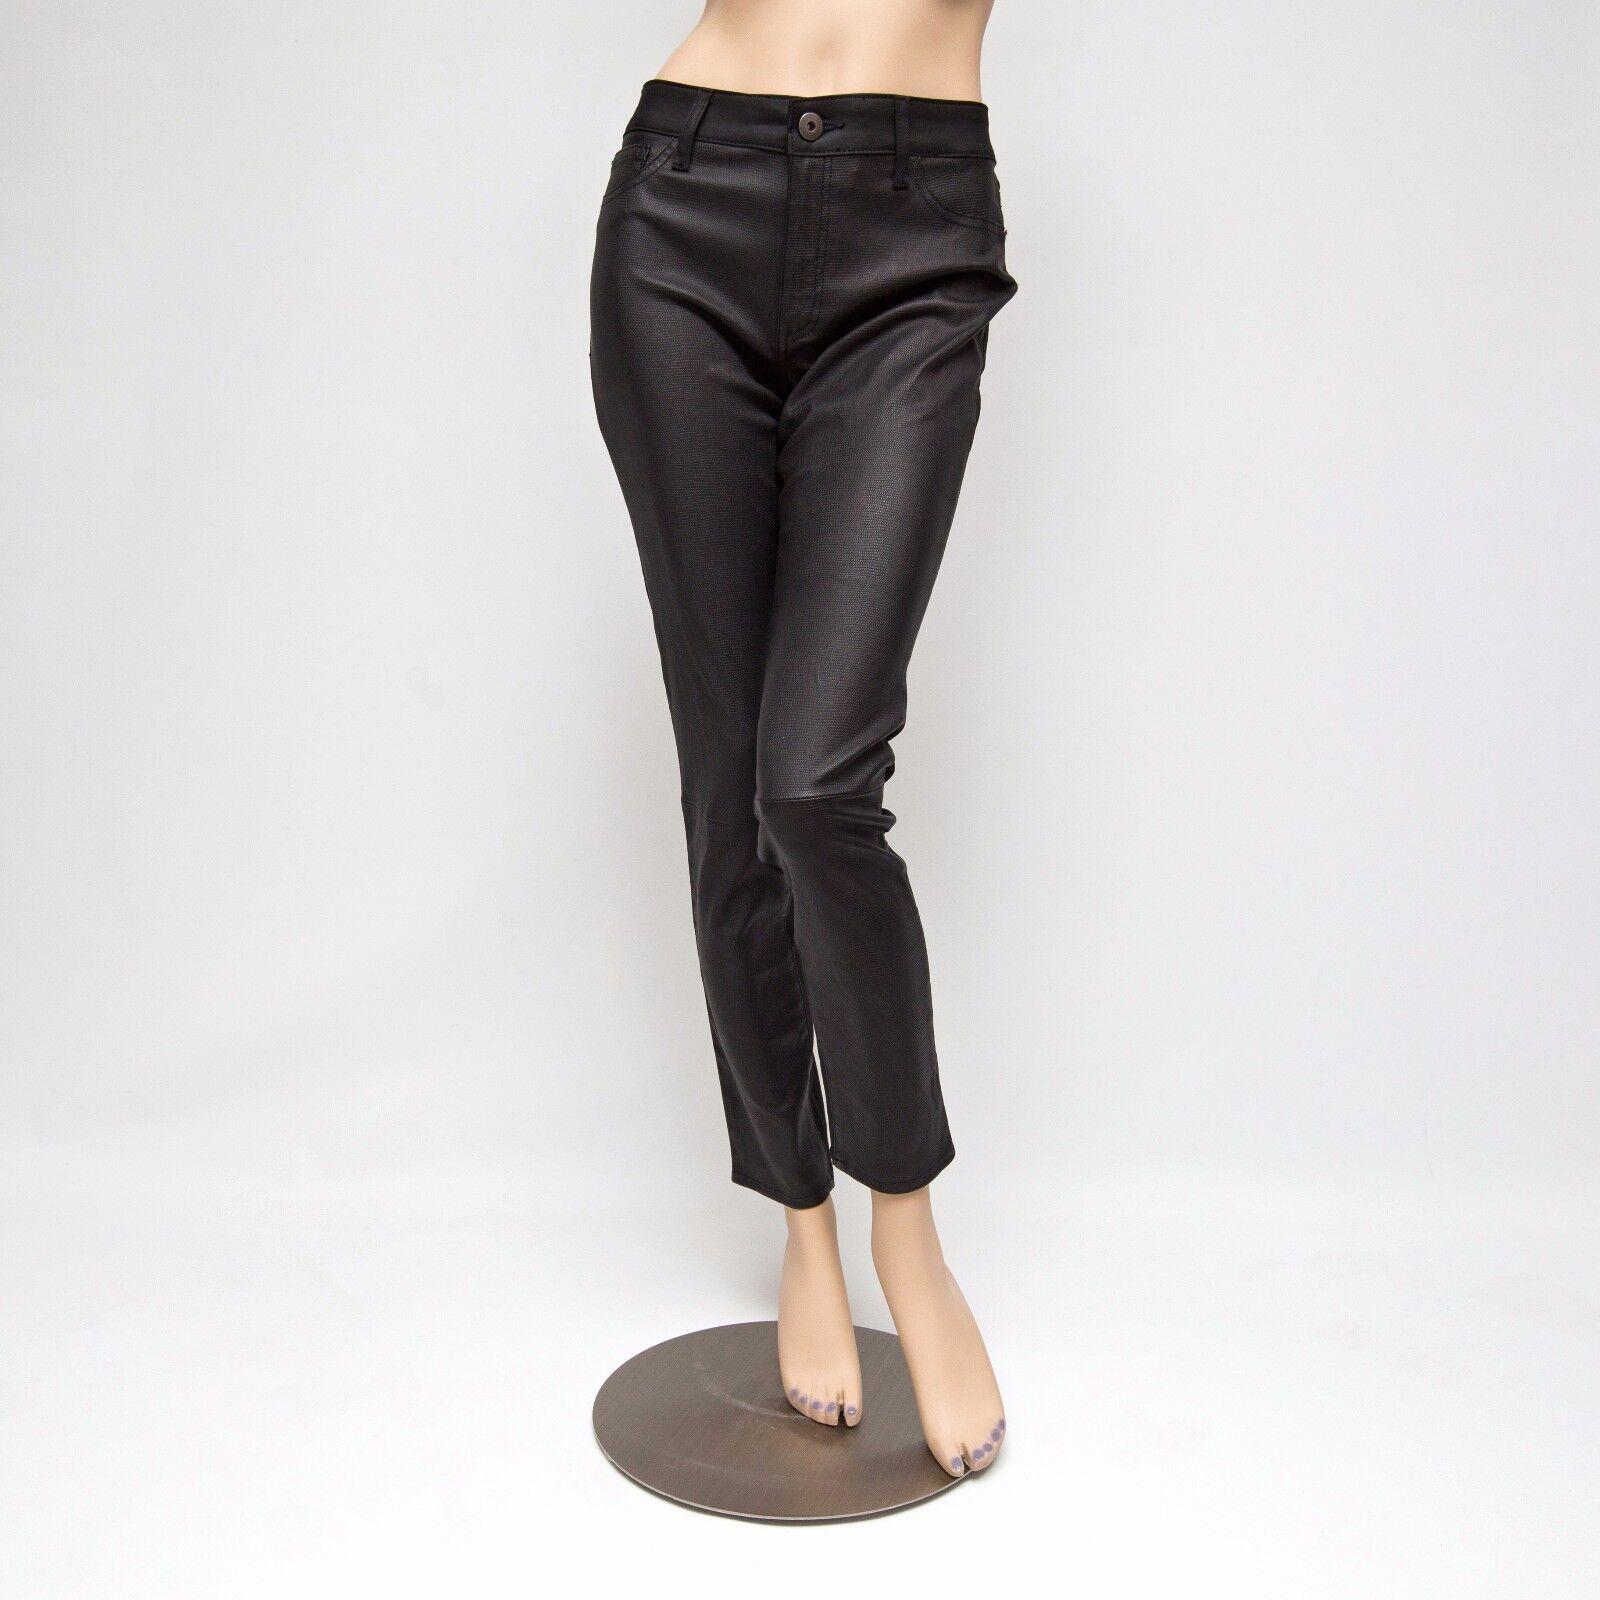 DL1961 DL Pro360 Florence Instasculpt Skylark Lamb Leather Panel Pants 31x29.5